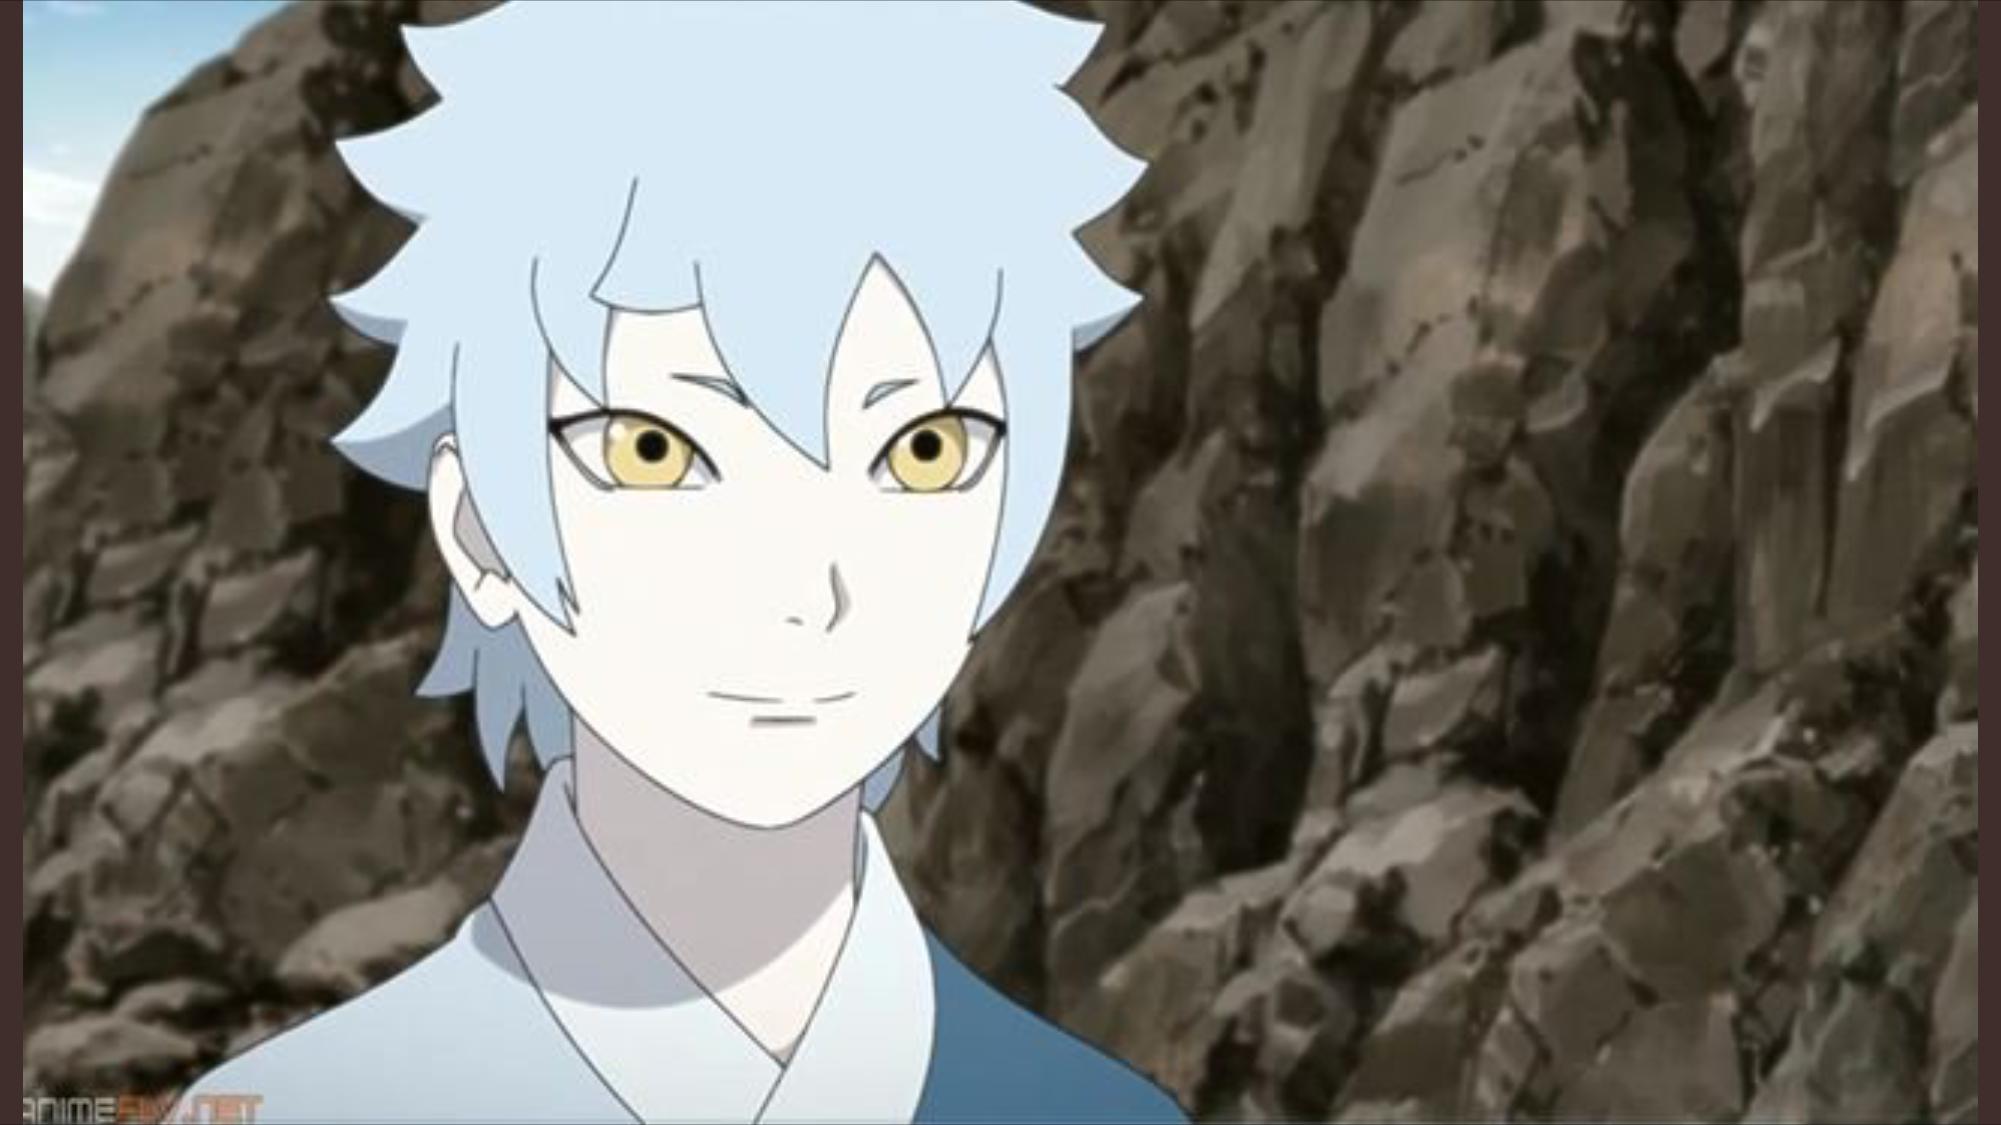 Anime de Danielle Bonanno em Boruto and Naruto Shippuuden